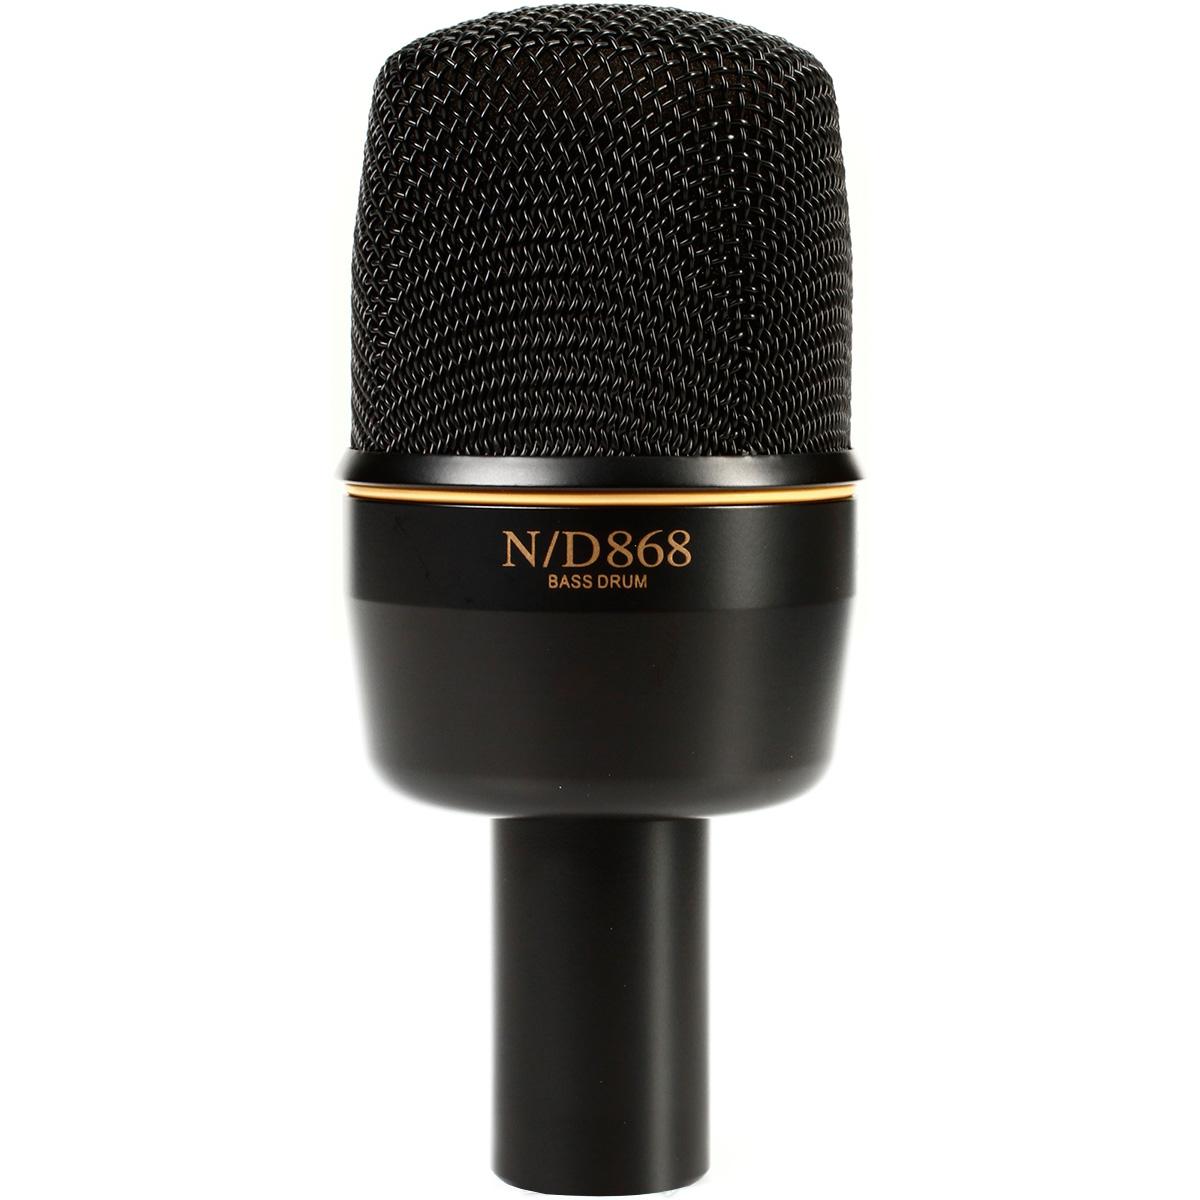 Microfone c/ Fio p/ Instrumentos ND 868 - Electro-Voice